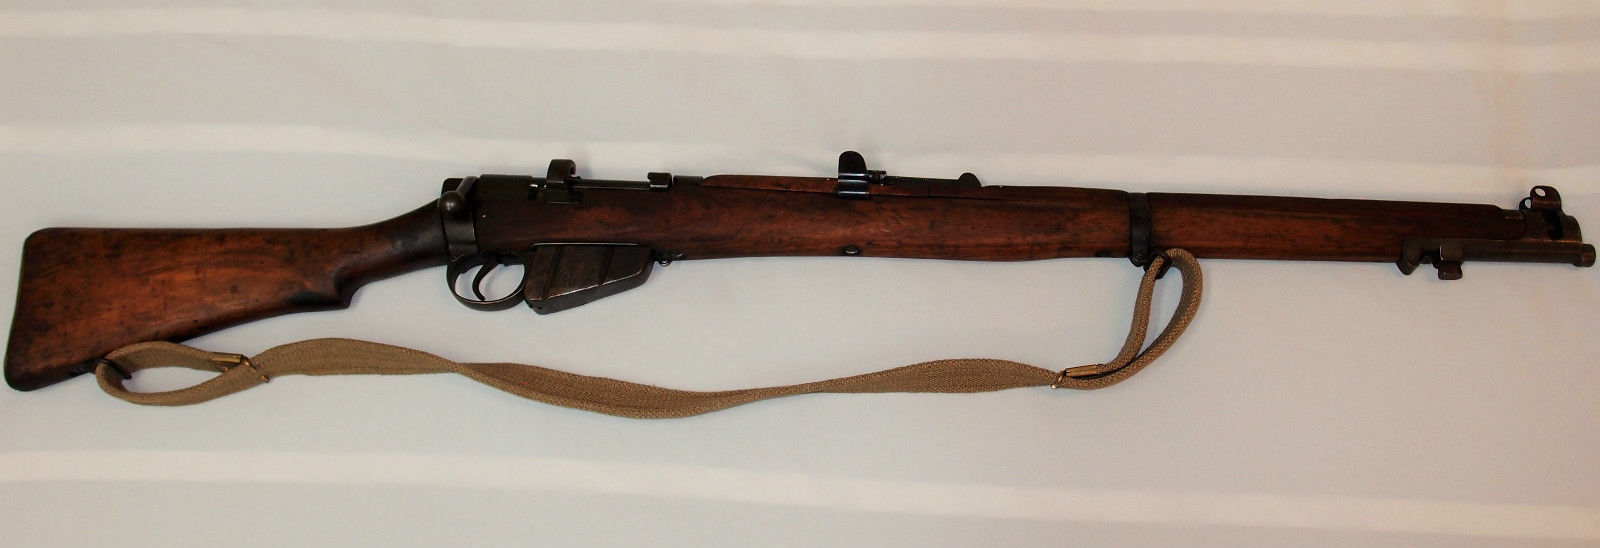 Ww2 Australian Lee Enfield 303 Rifle Jb Military Antiques